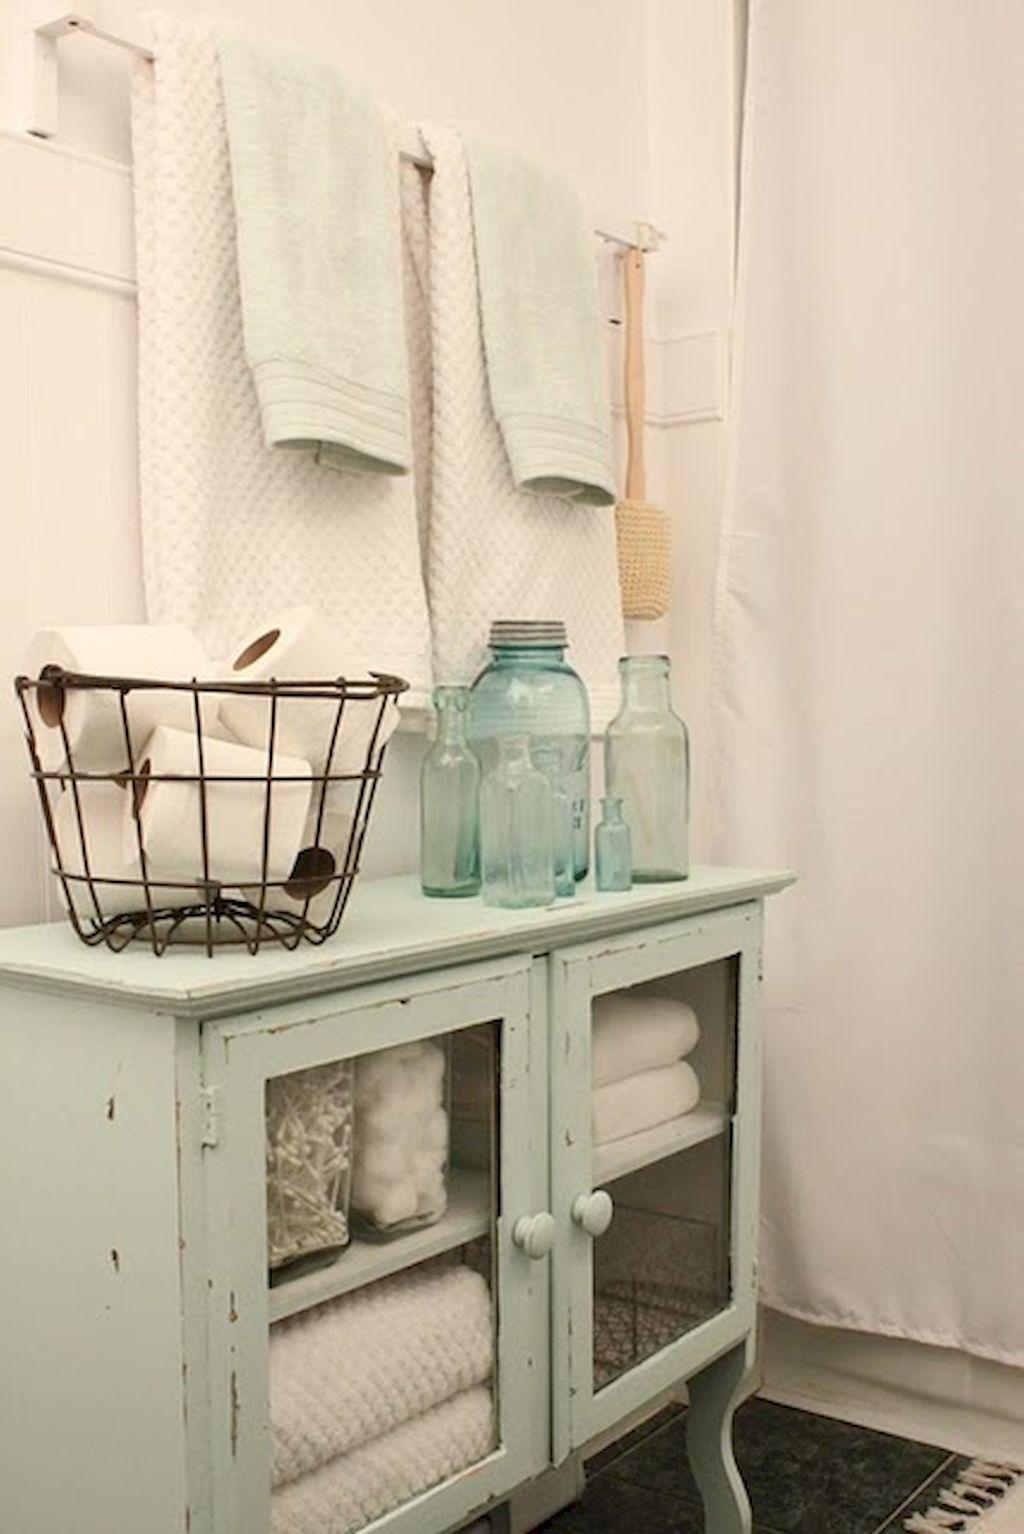 Best Photo Gallery Websites Adorable Stunning Shabby Chic Bathroom Decoration Ideas https homeastern